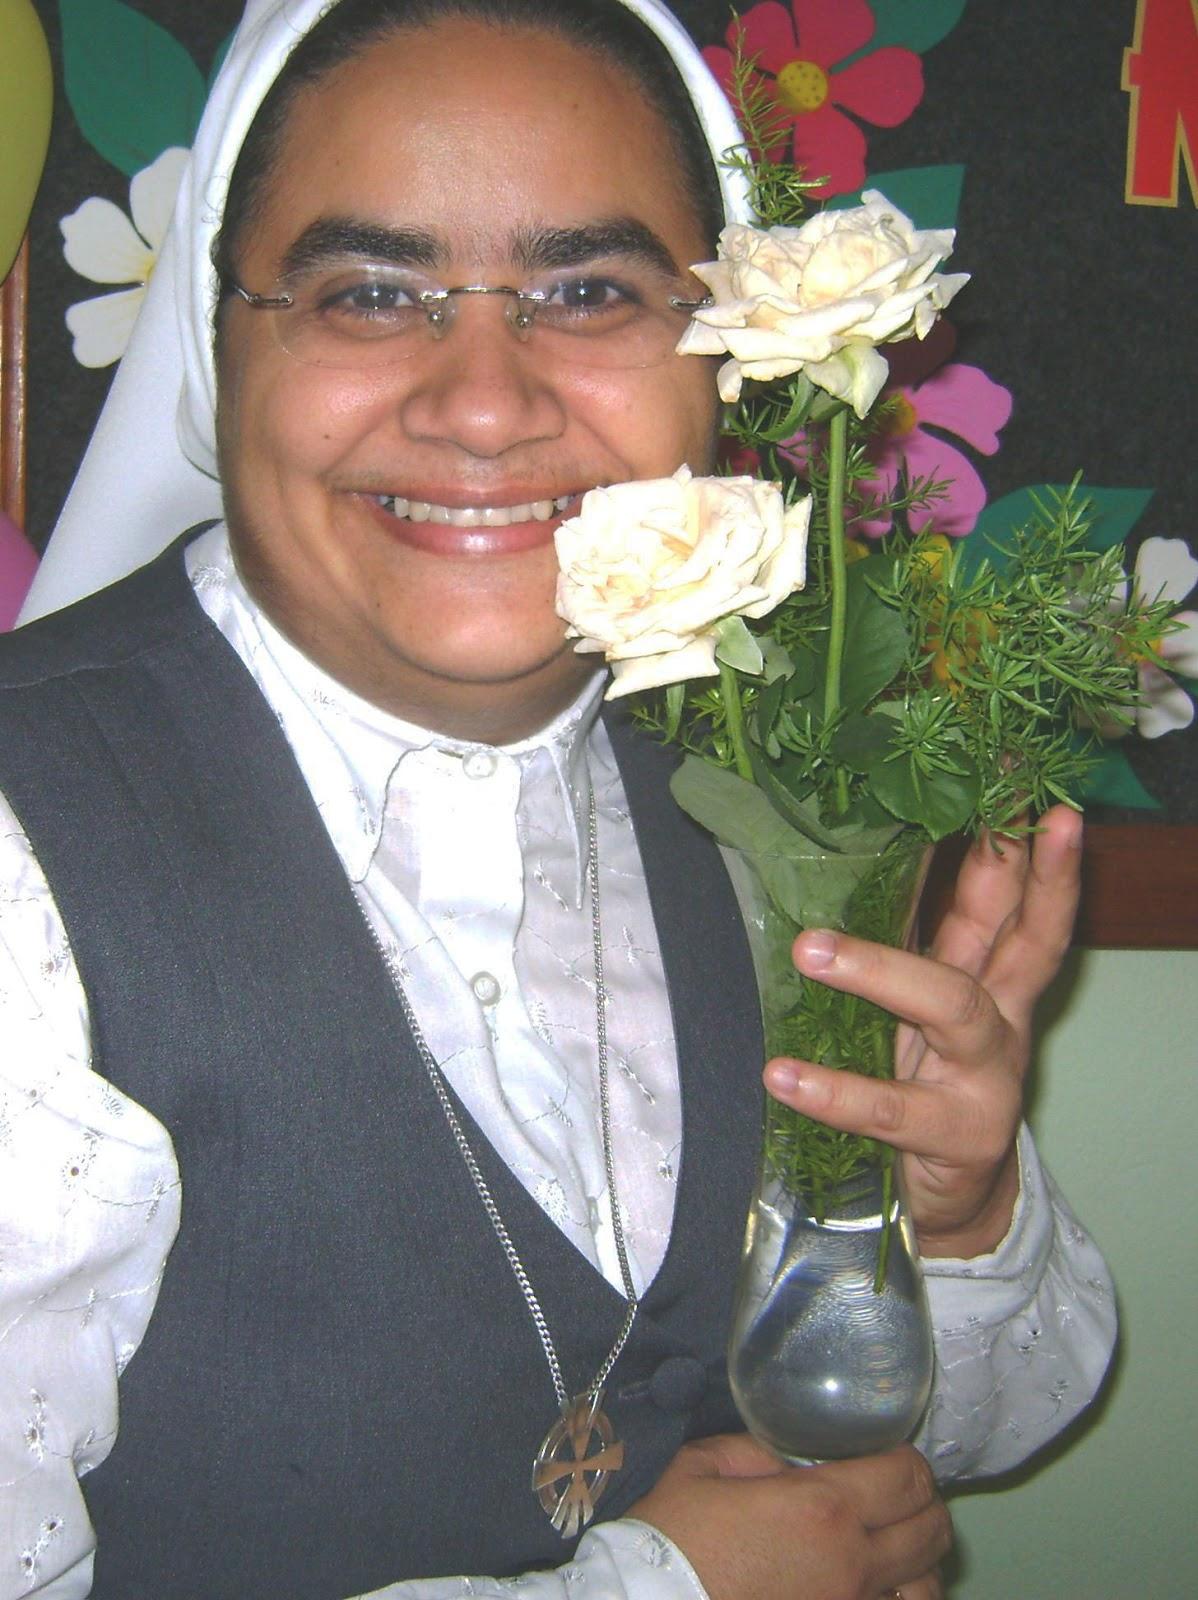 O amor divino informa parab ns irm maria jos silva - Divinos pucheros maria jose ...